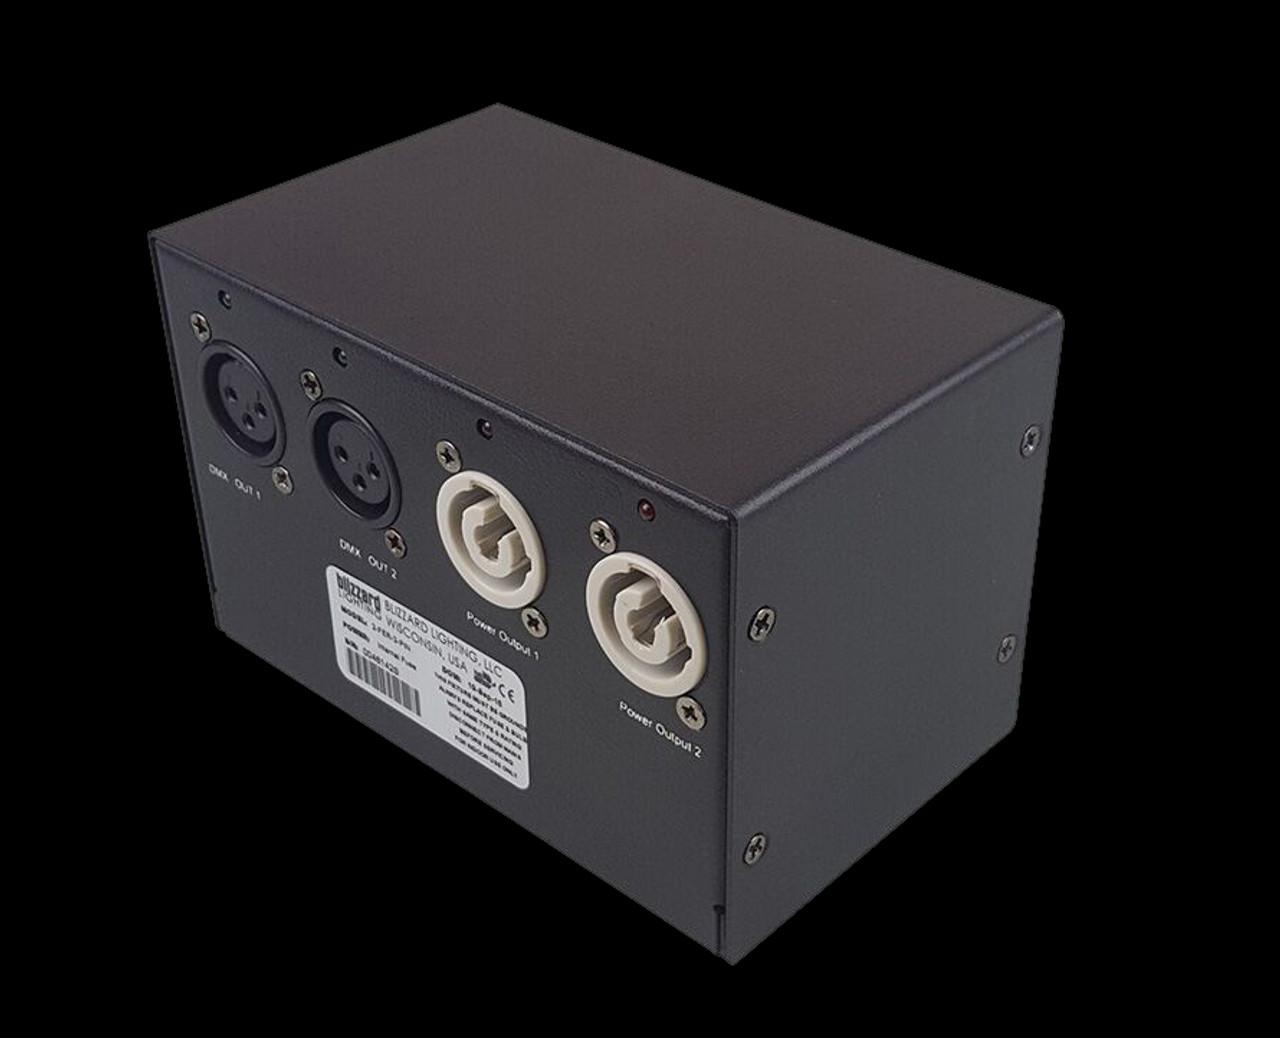 Blizzard Lighting 2-Fer / 2-way Power Splitter + 2-way DMX Splitter